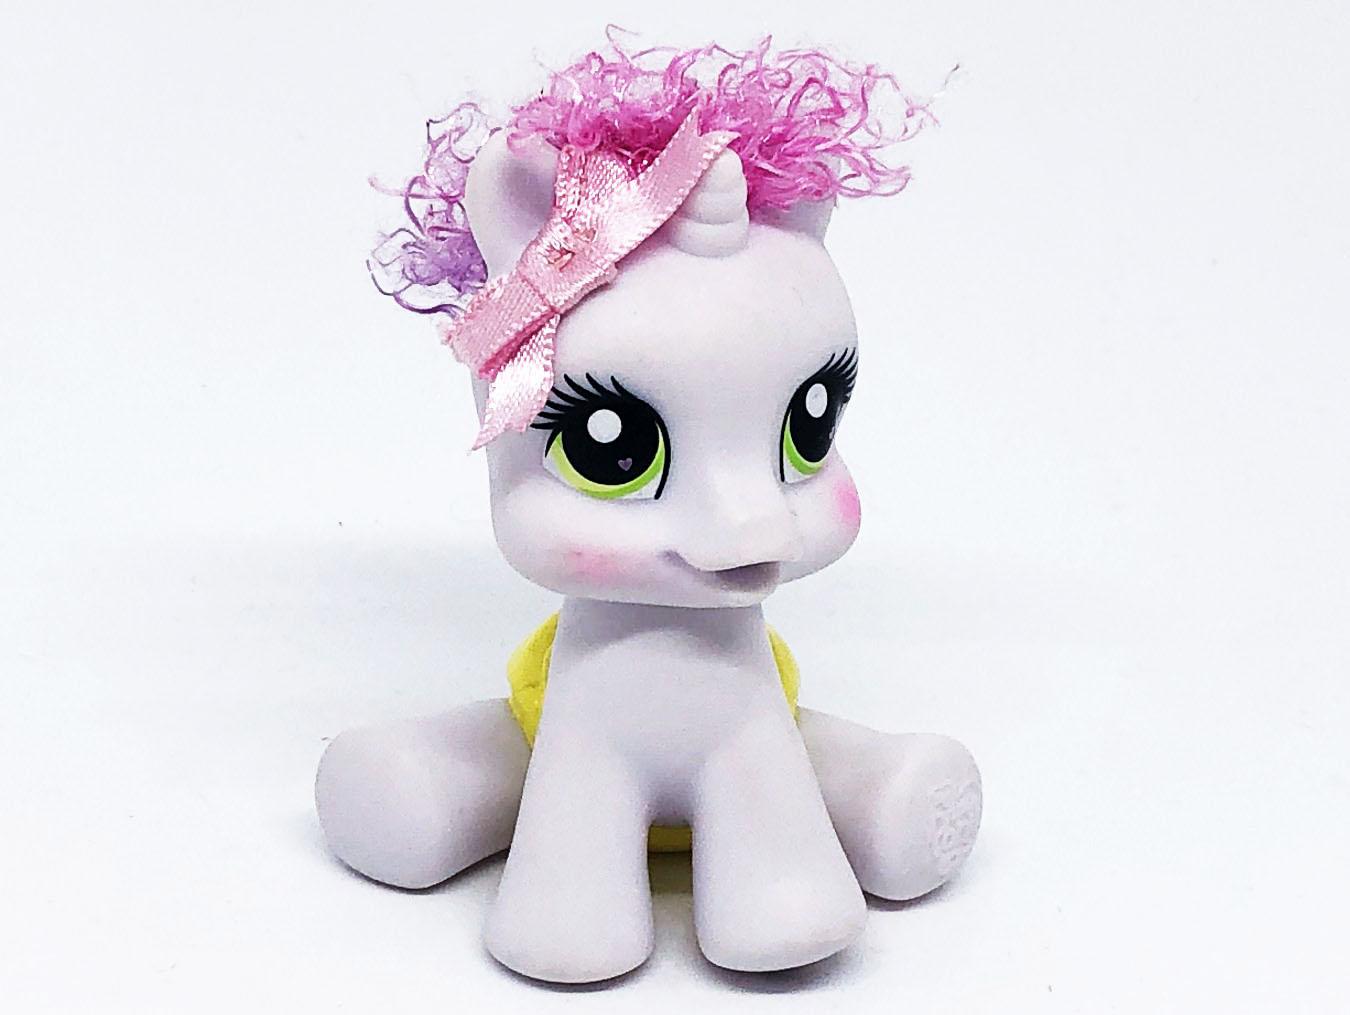 Sweetie Belle (Newborn Cutie)